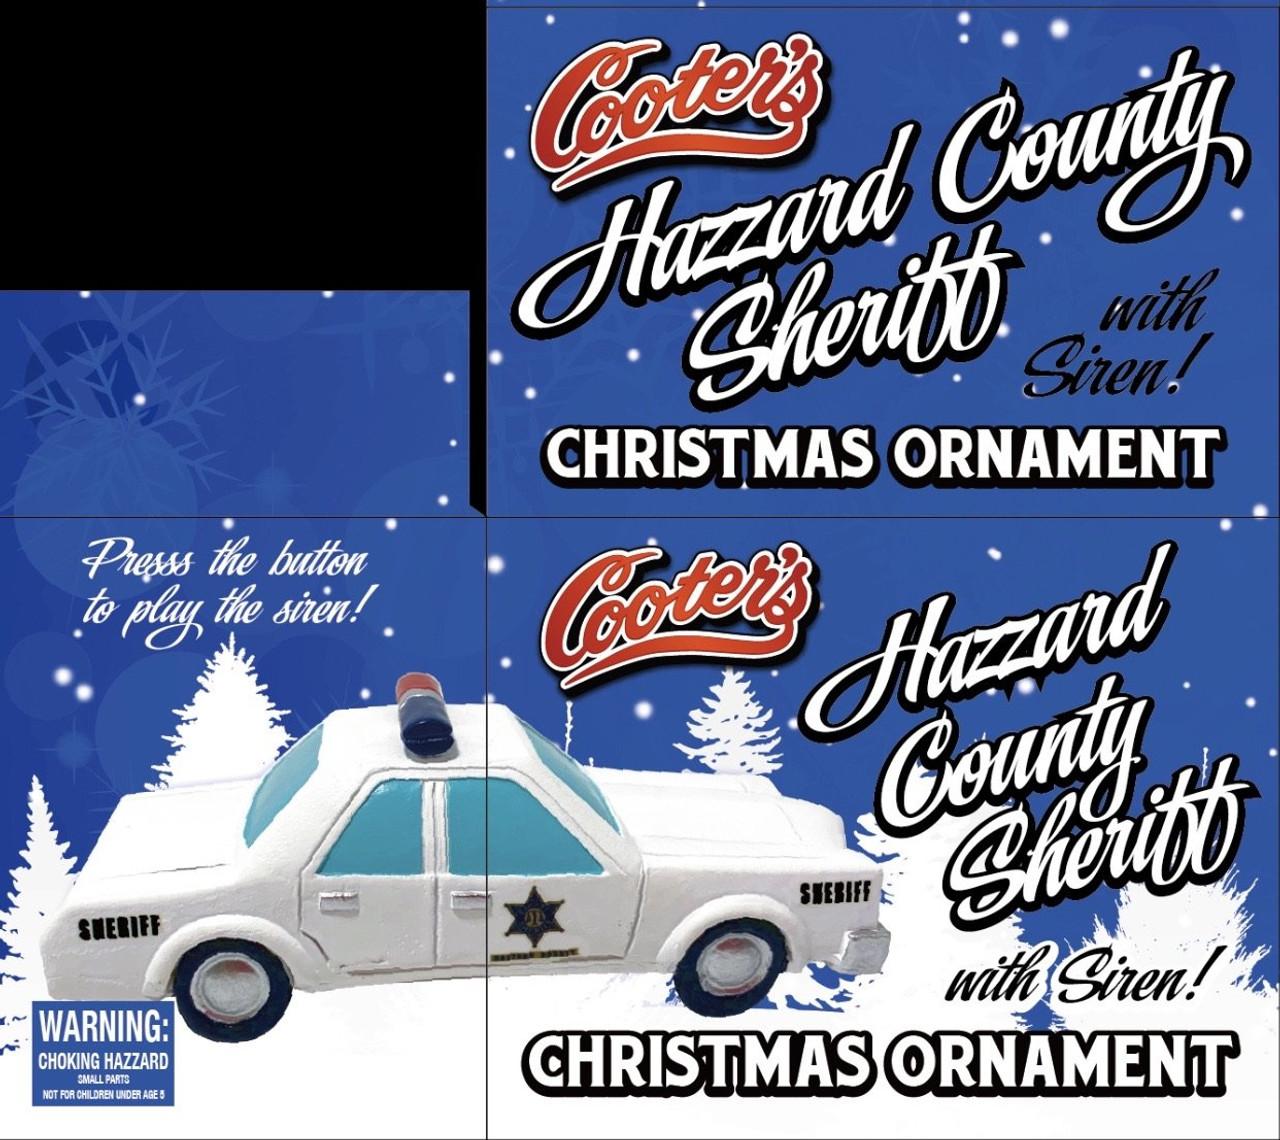 Hazzard County Sheriff Christmas Ornament W/Police Siren Sound Button